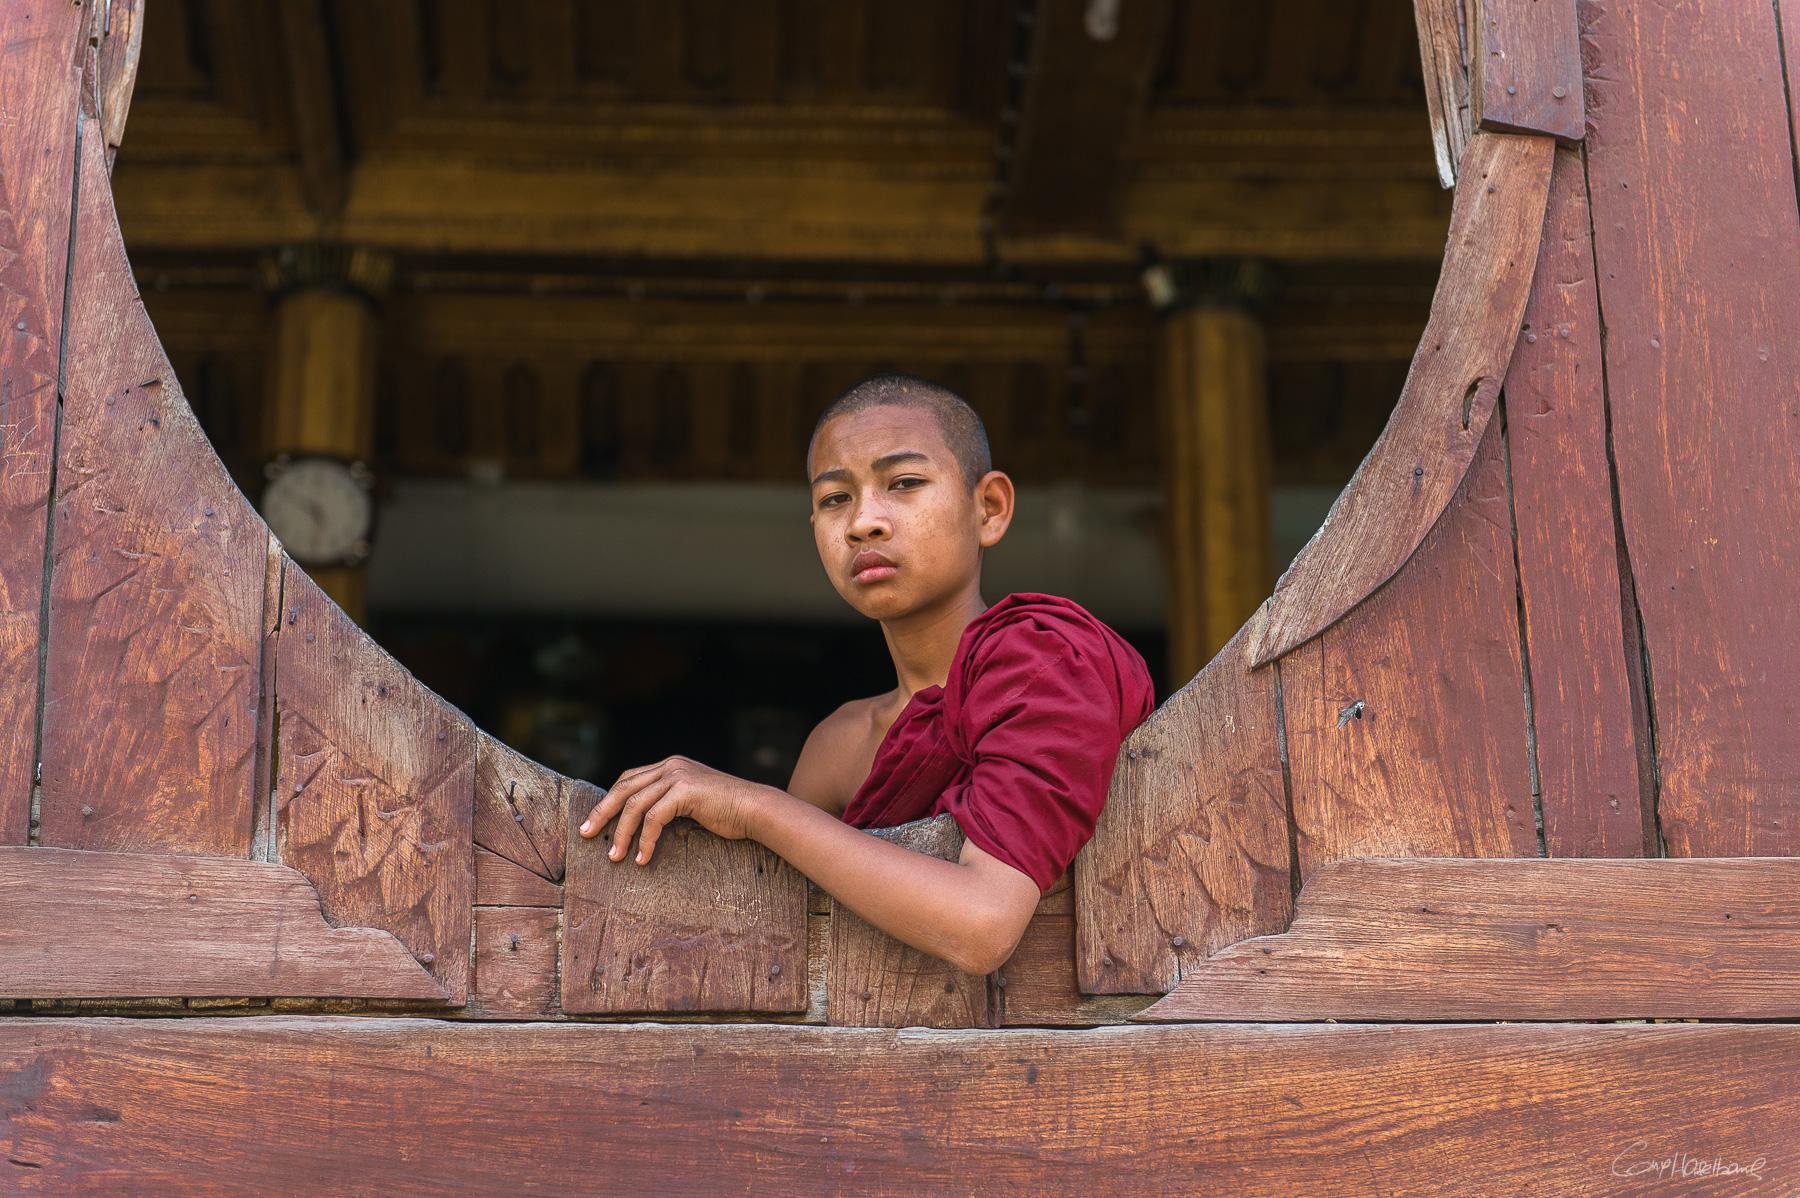 Moine de Shwe Yan Pyay monastery  (région lac ile) - Birmanie.